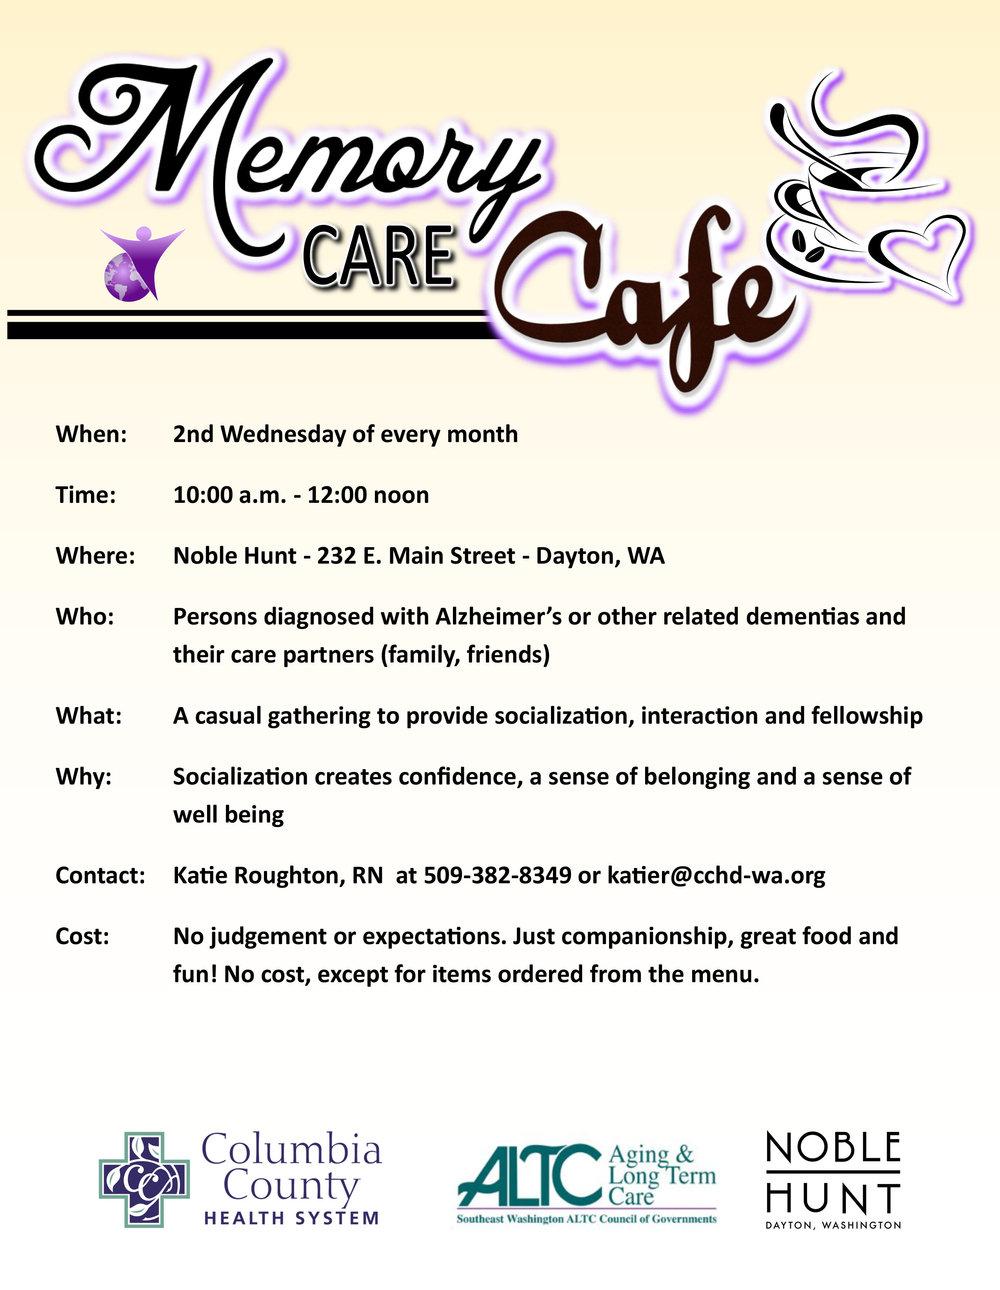 Memory Care Cafe final.jpg